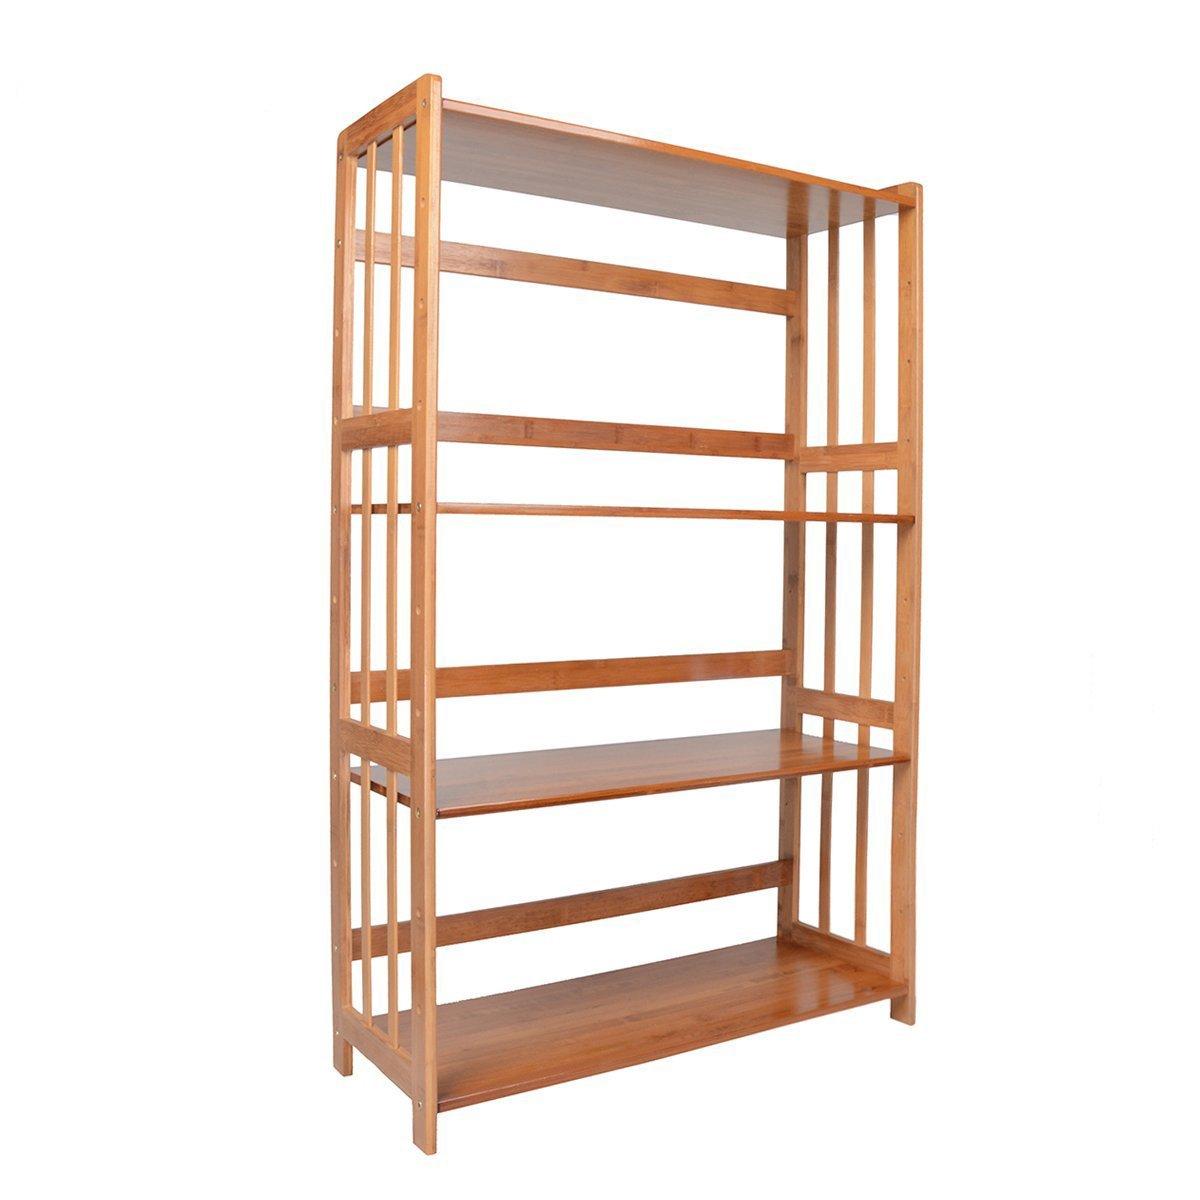 Saim Adjustable Bamboo Bookshelf Multifunctional Bathroom Kitchen Living Room Holder 4-Tier Utility Storage Rack Shelf